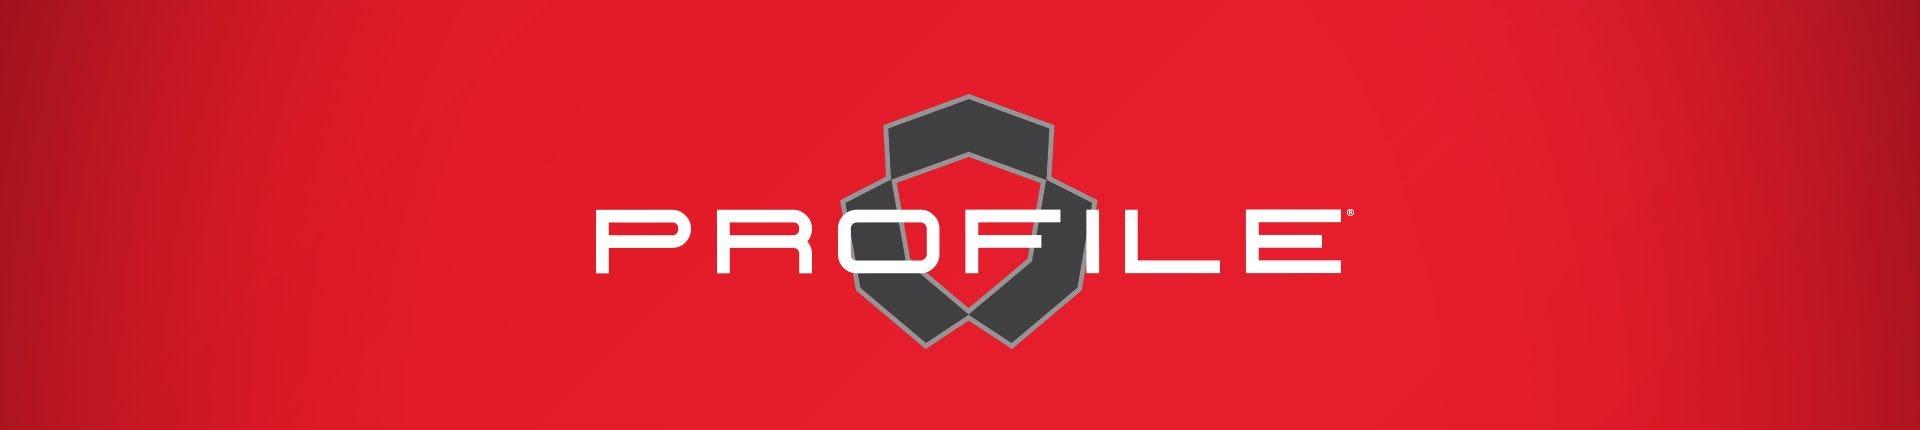 Profile Title Banner